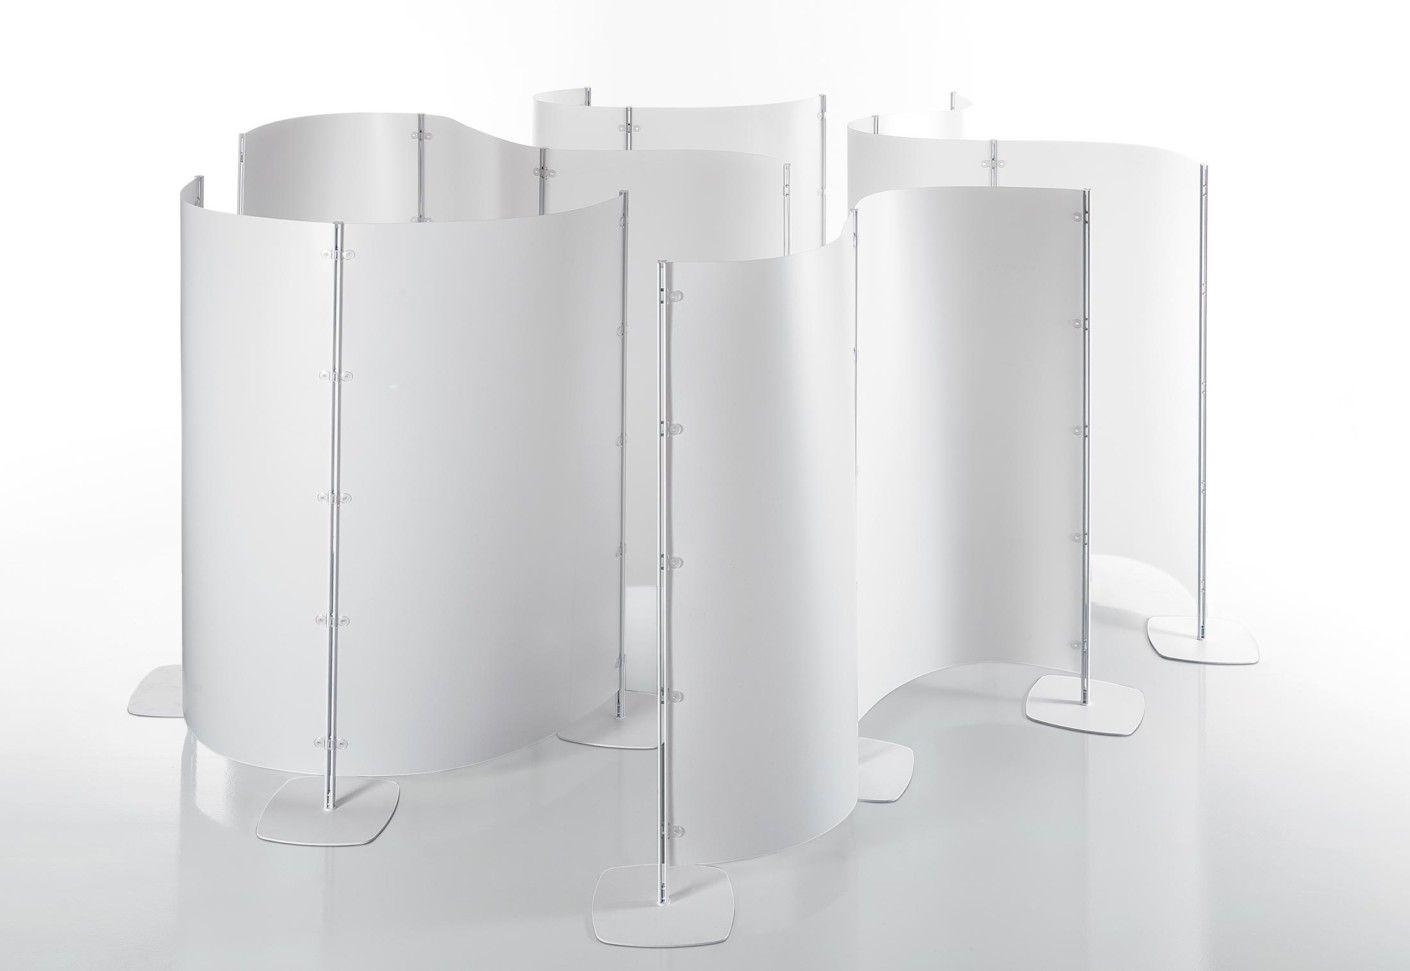 Buromobel Sichtschutz Buroeinrichtung Raumteiler Burogestaltung